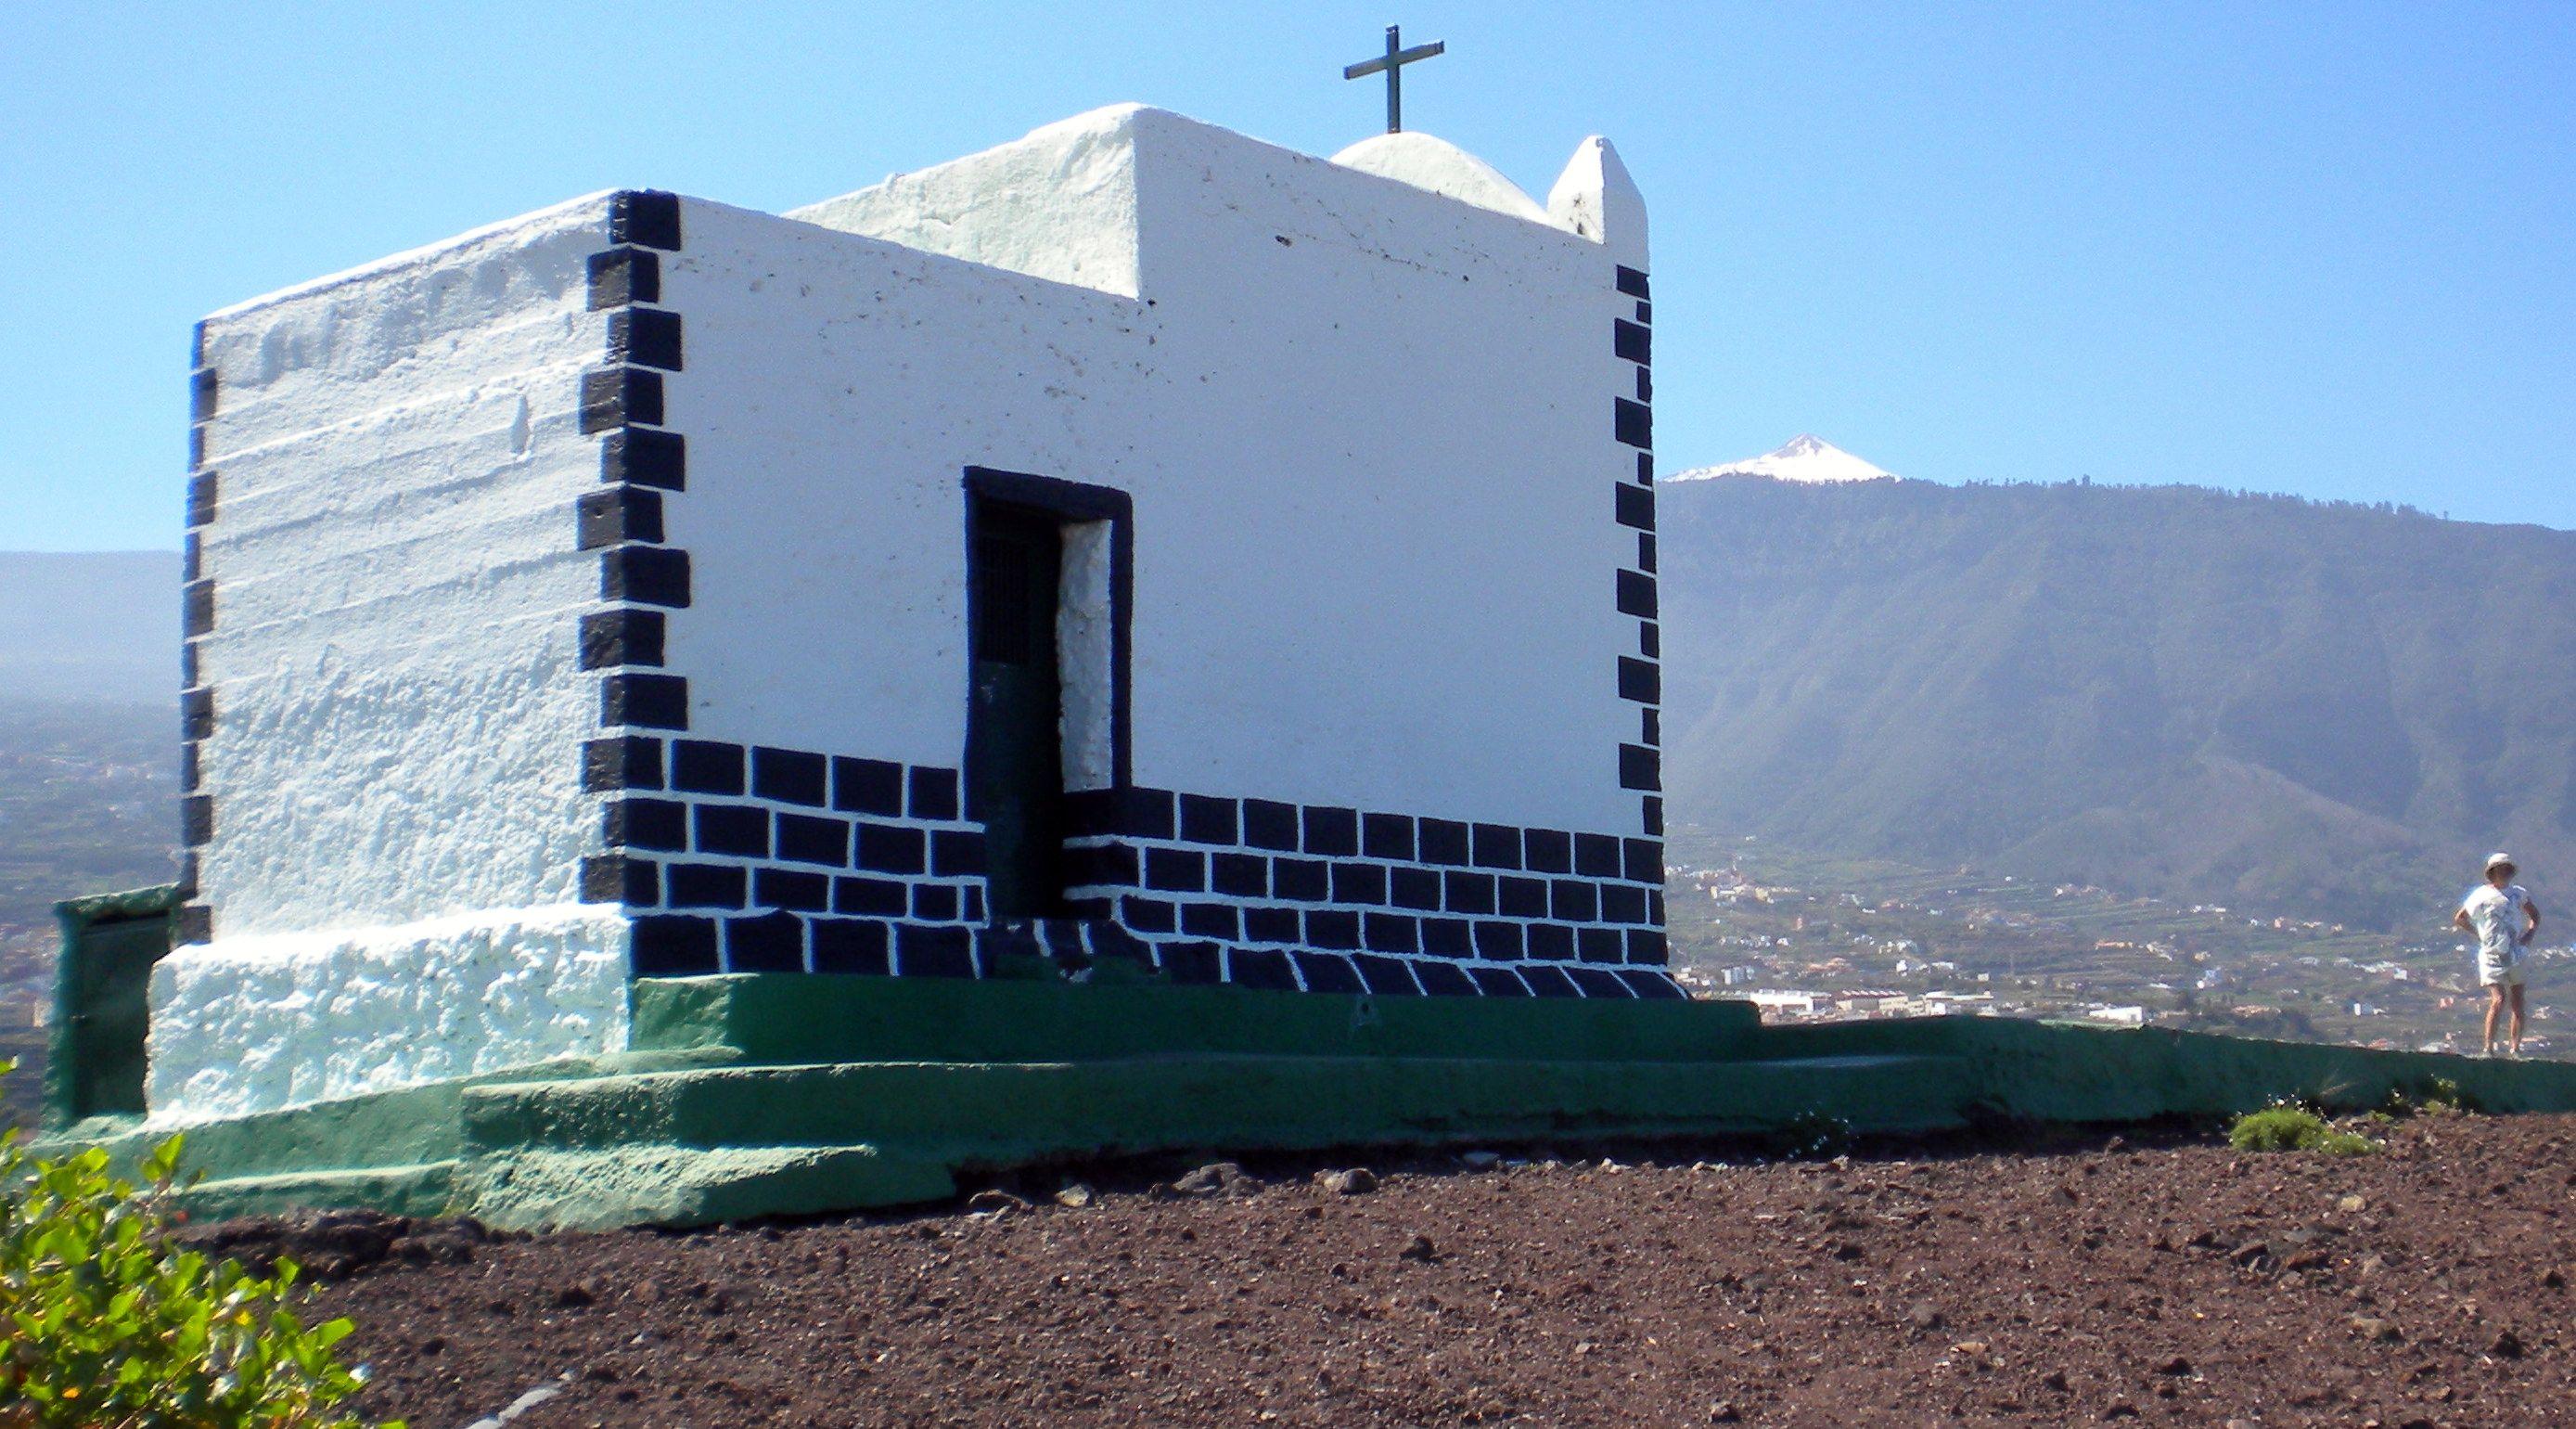 Ermita de la Cruz chapel of la Montaneta de los frailes